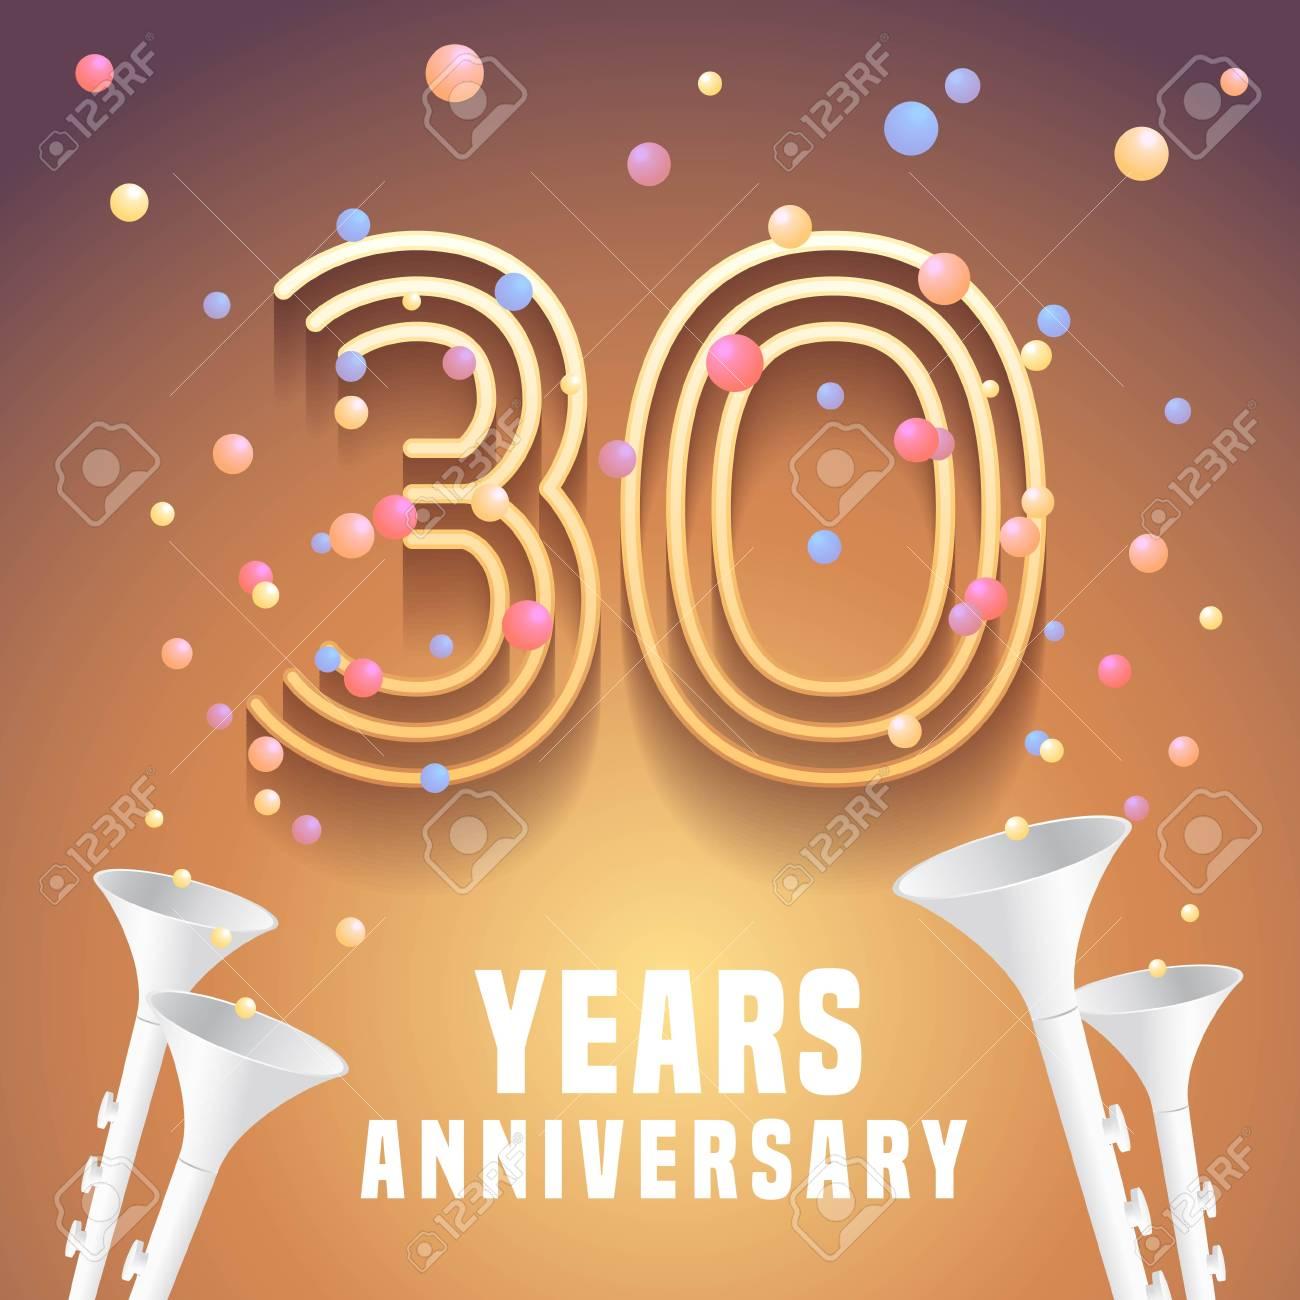 30 Years Anniversary Vector Icon Symbol Graphic Design Element